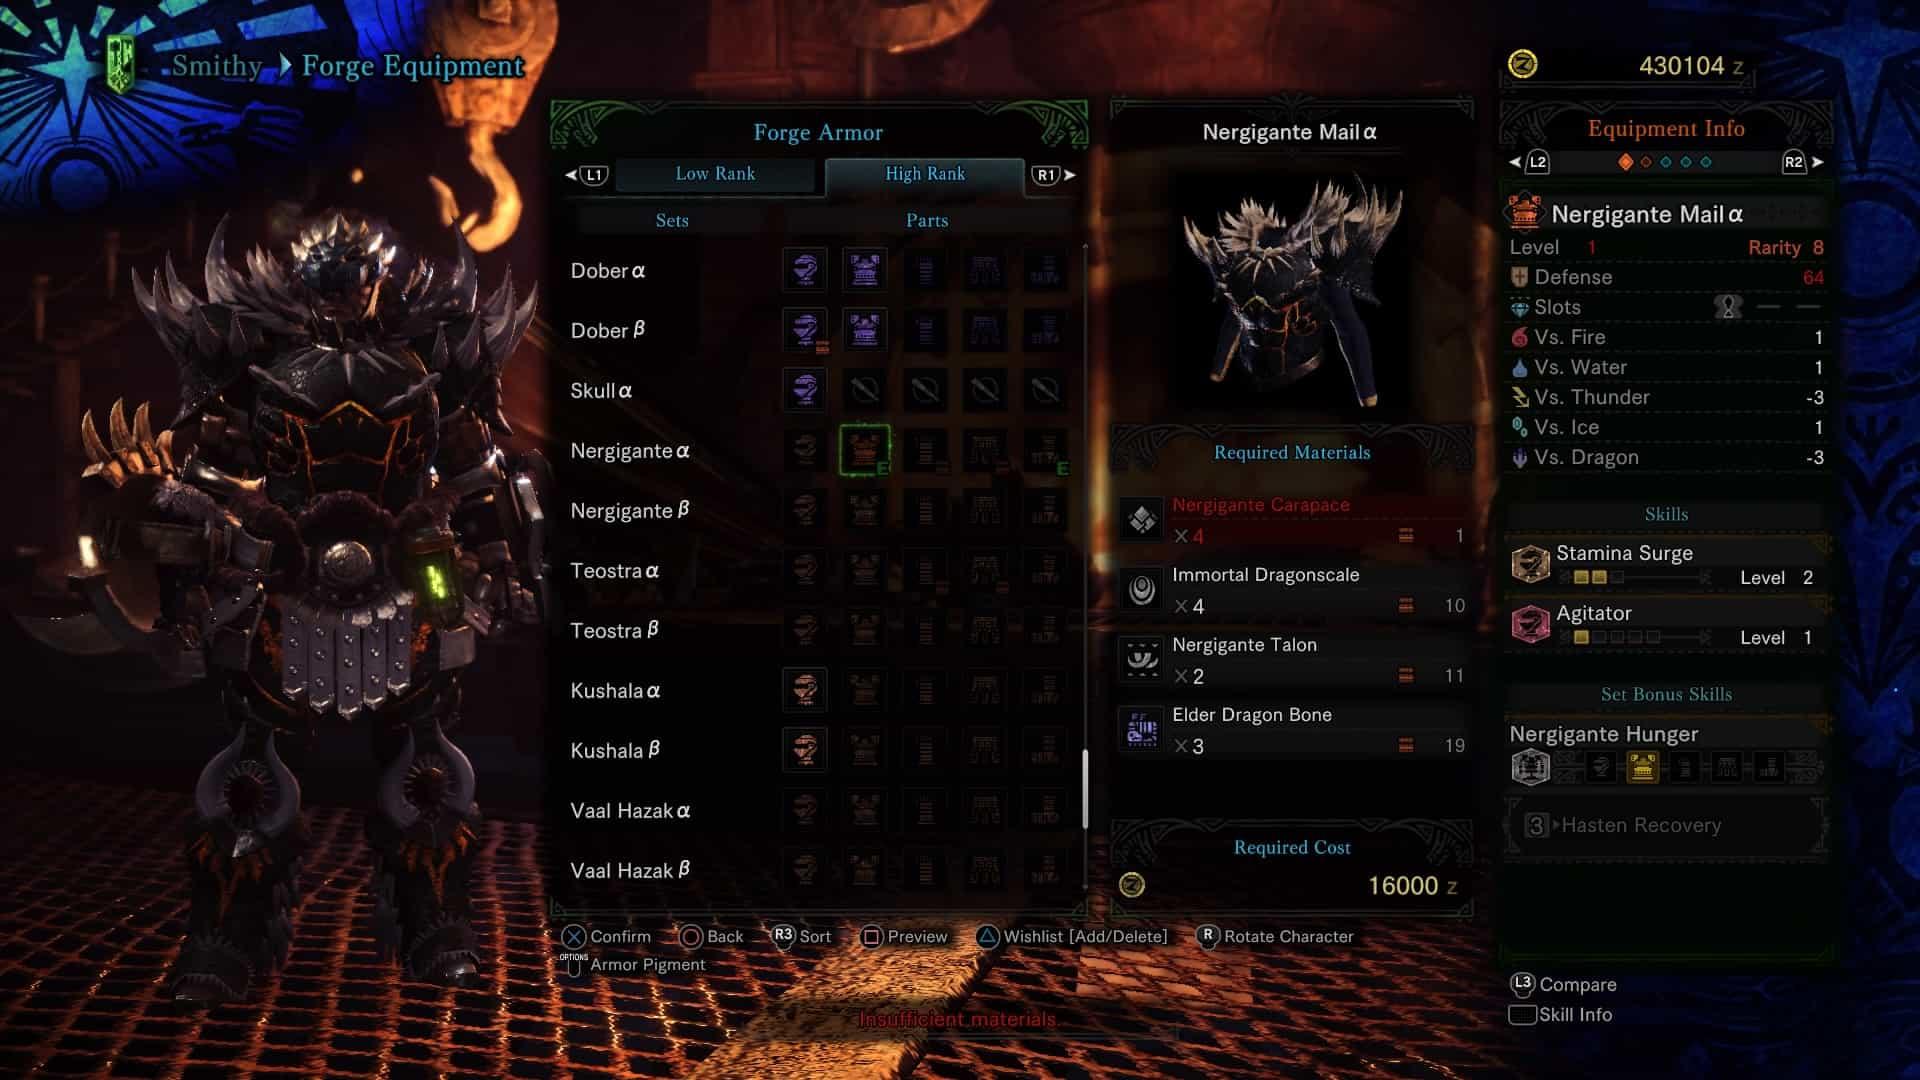 MHW Sword & Shield - Build Nergi Chest